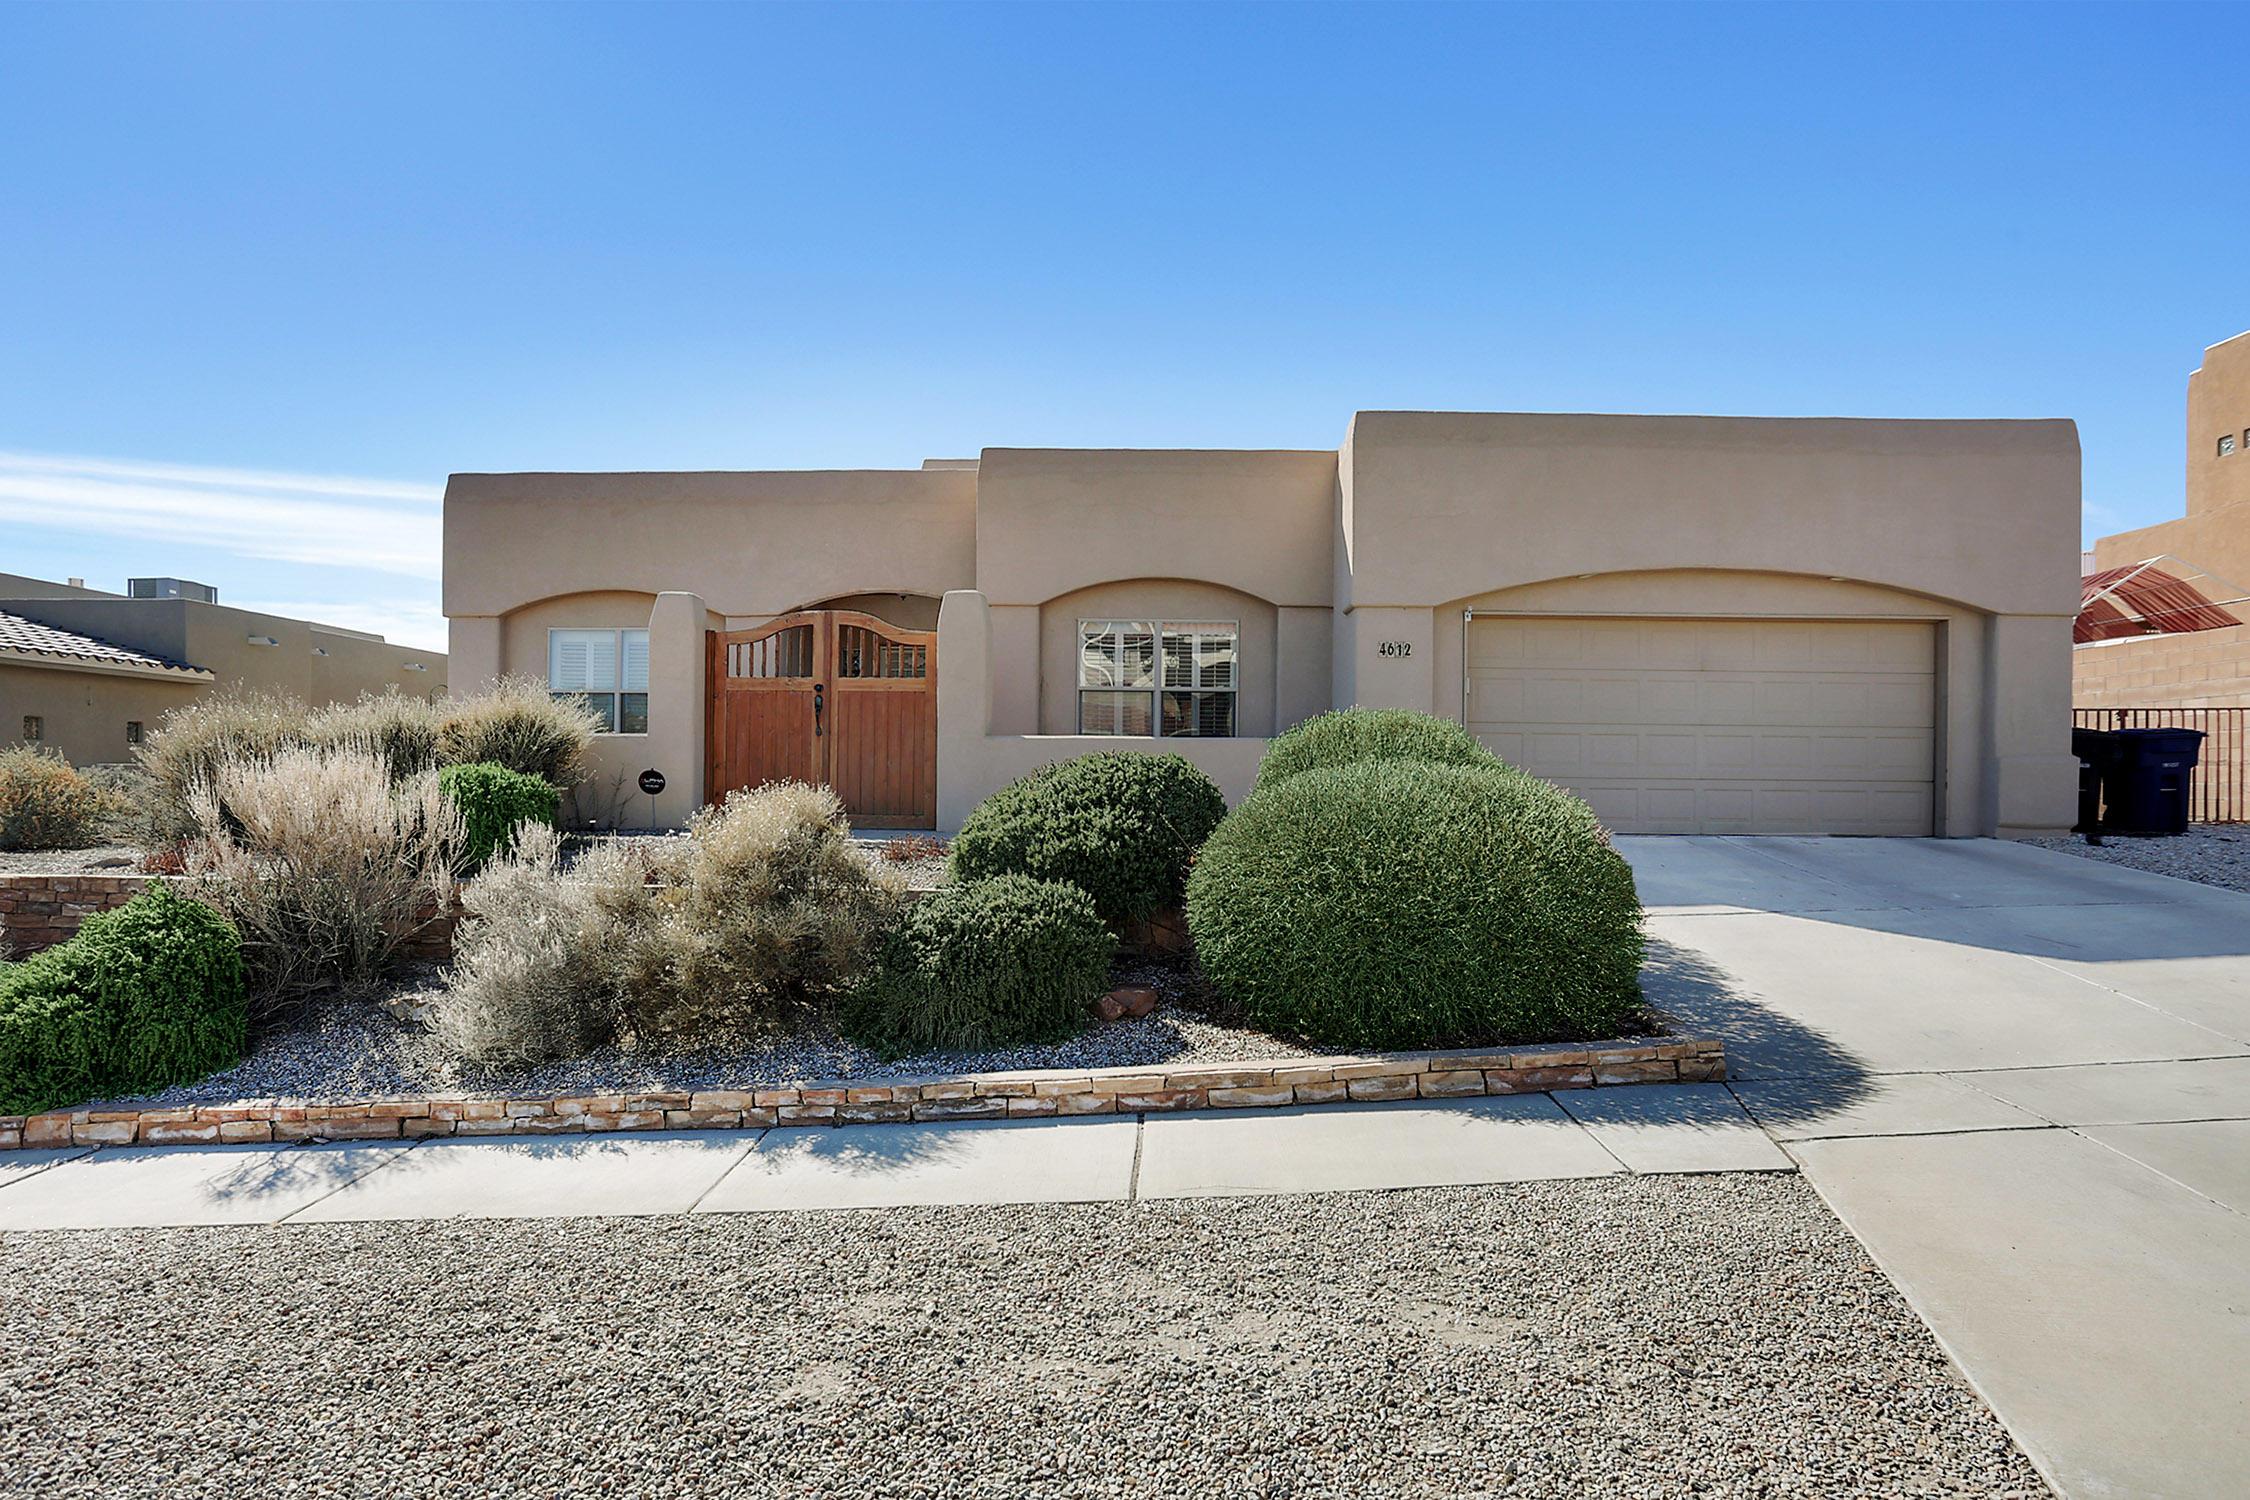 4612 NW Congress Avenue, Northwest Albuquerque and Northwest Heights, New Mexico